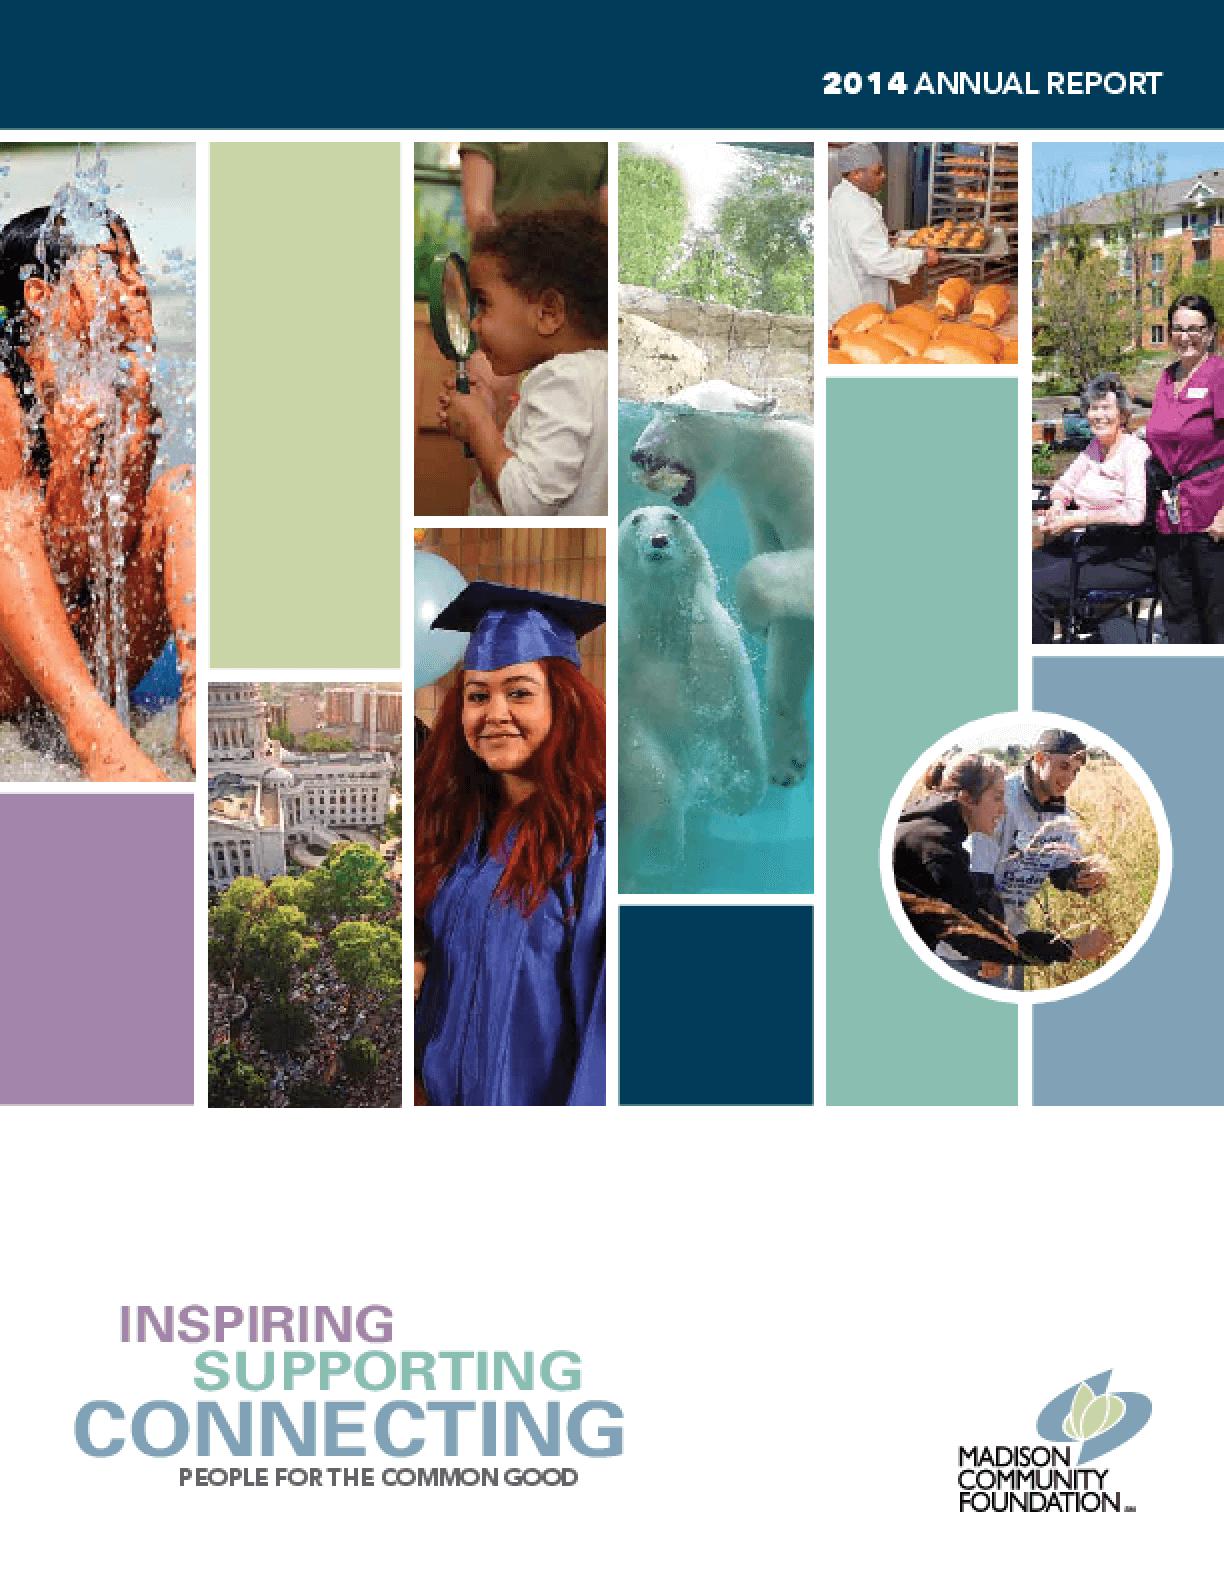 Madison Community Foundation, 2014 Annual Report